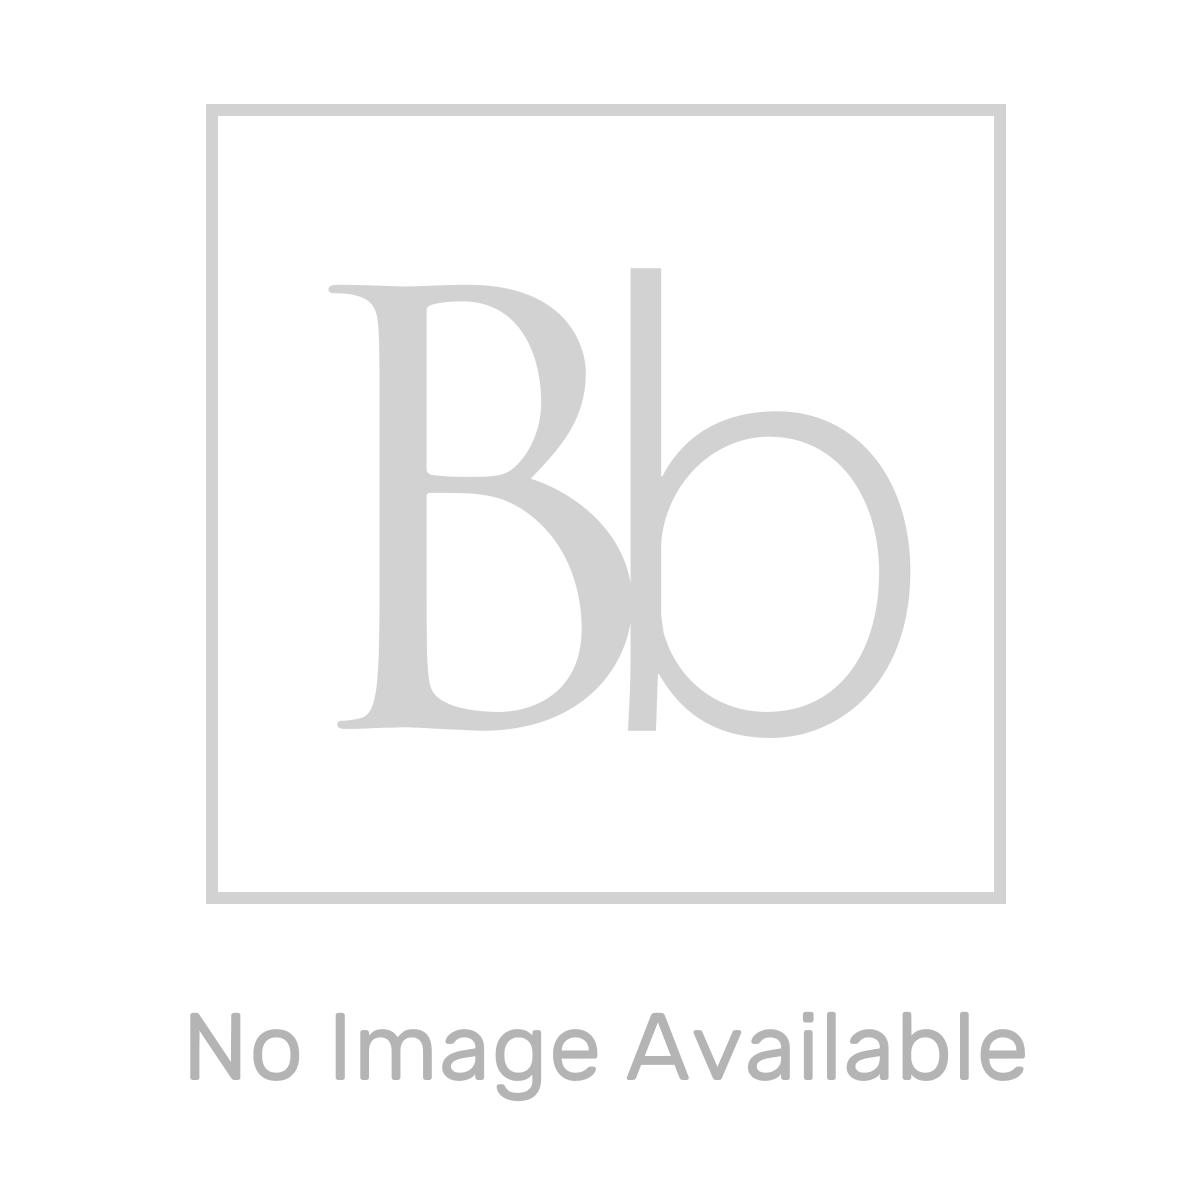 Nuie Athena Driftwood 2 Door Floor Standing Vanity Unit with 40mm Profile Basin 500mm Line Drawing